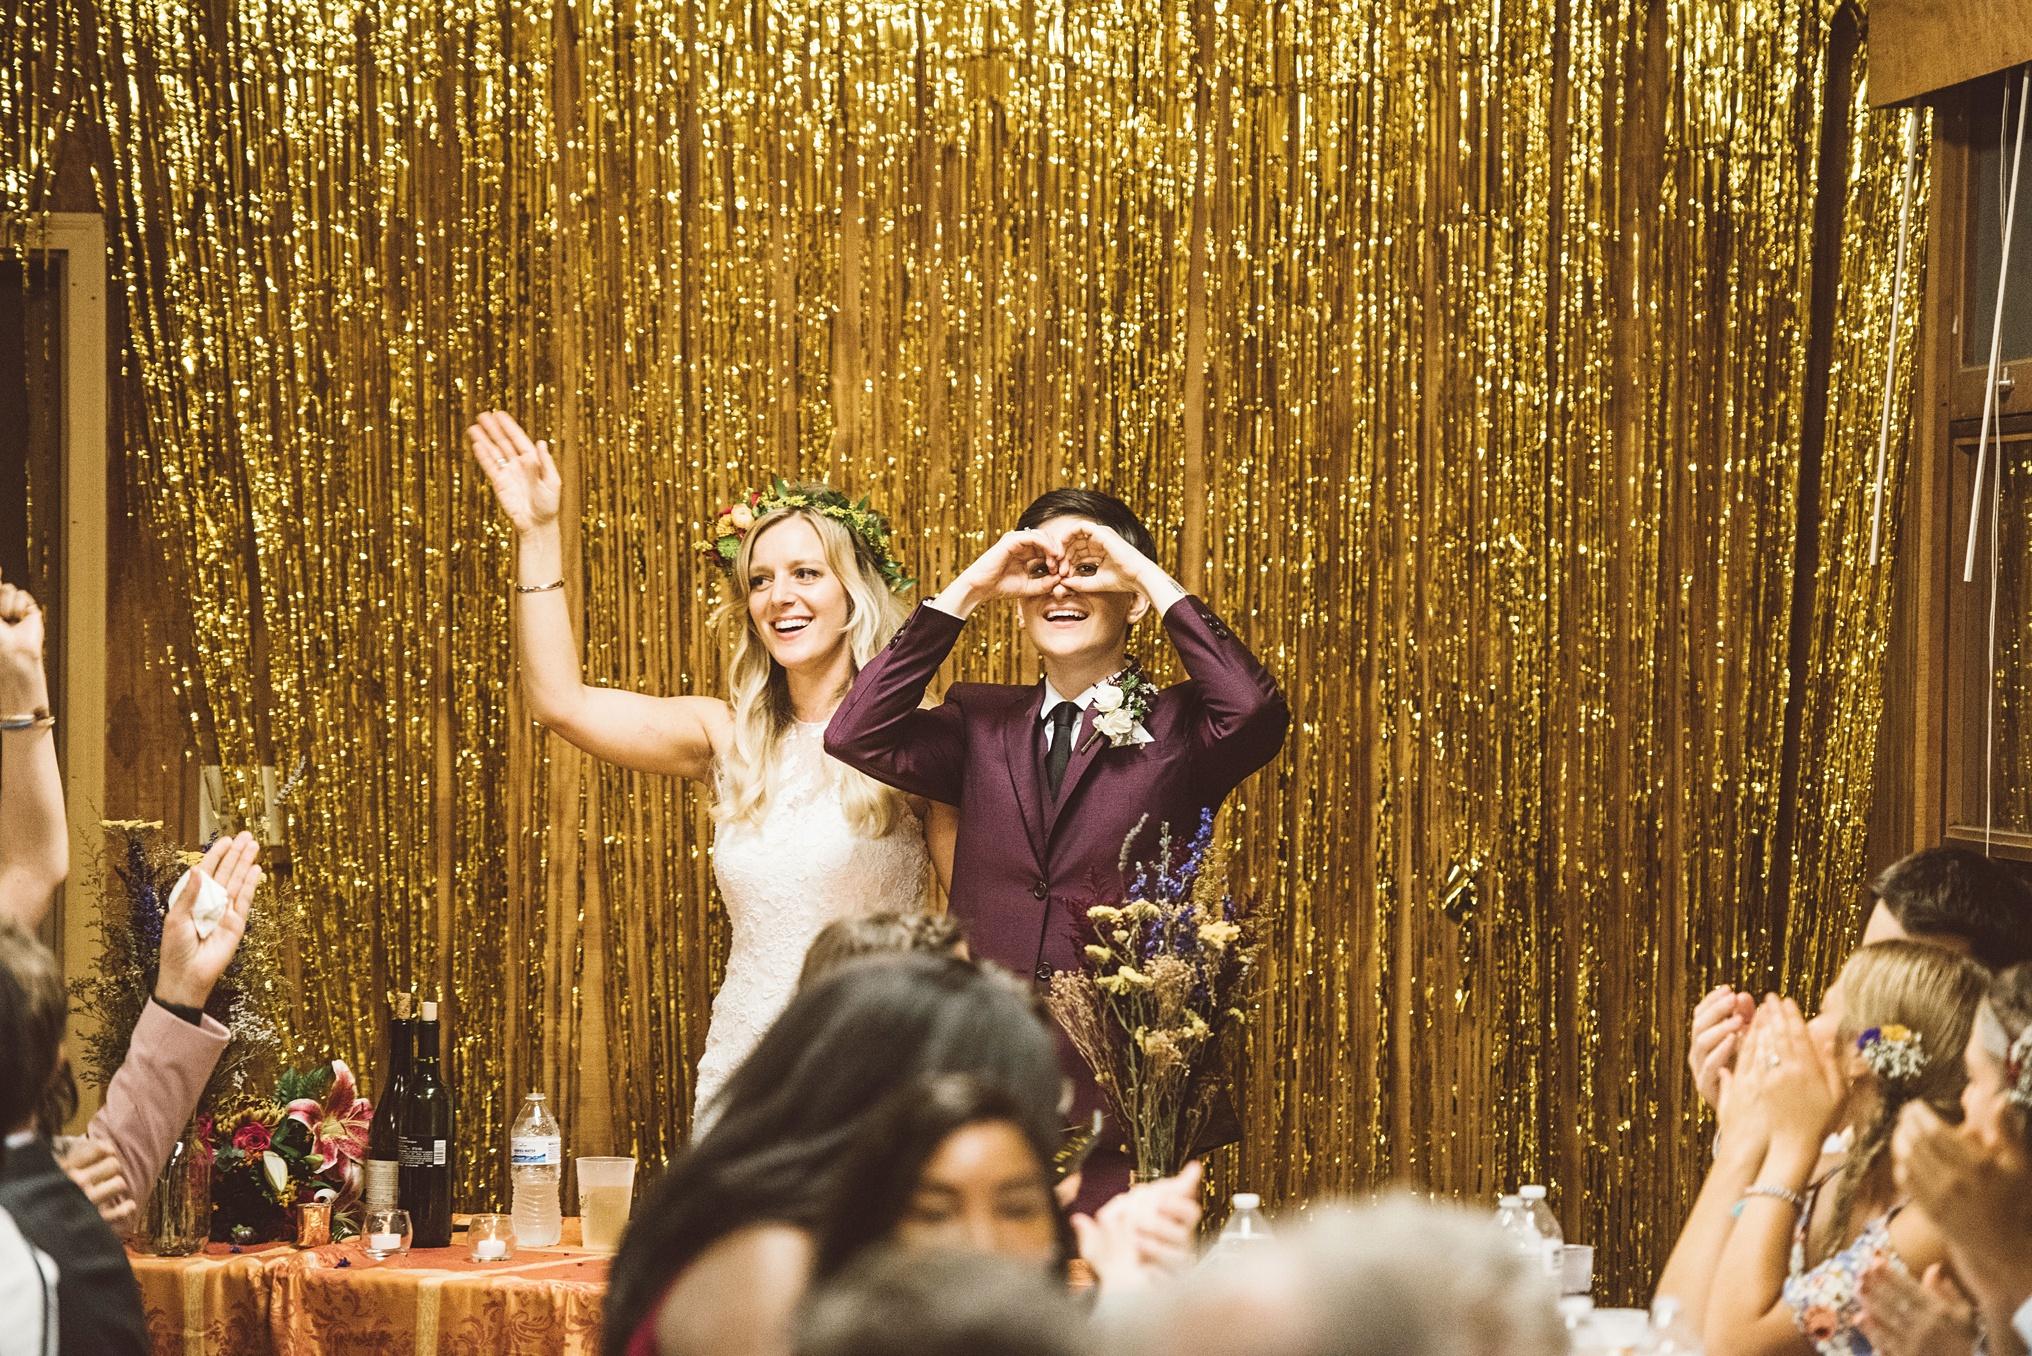 best_wedding_photography_2017_by_lucas_botz_photography_004.jpg